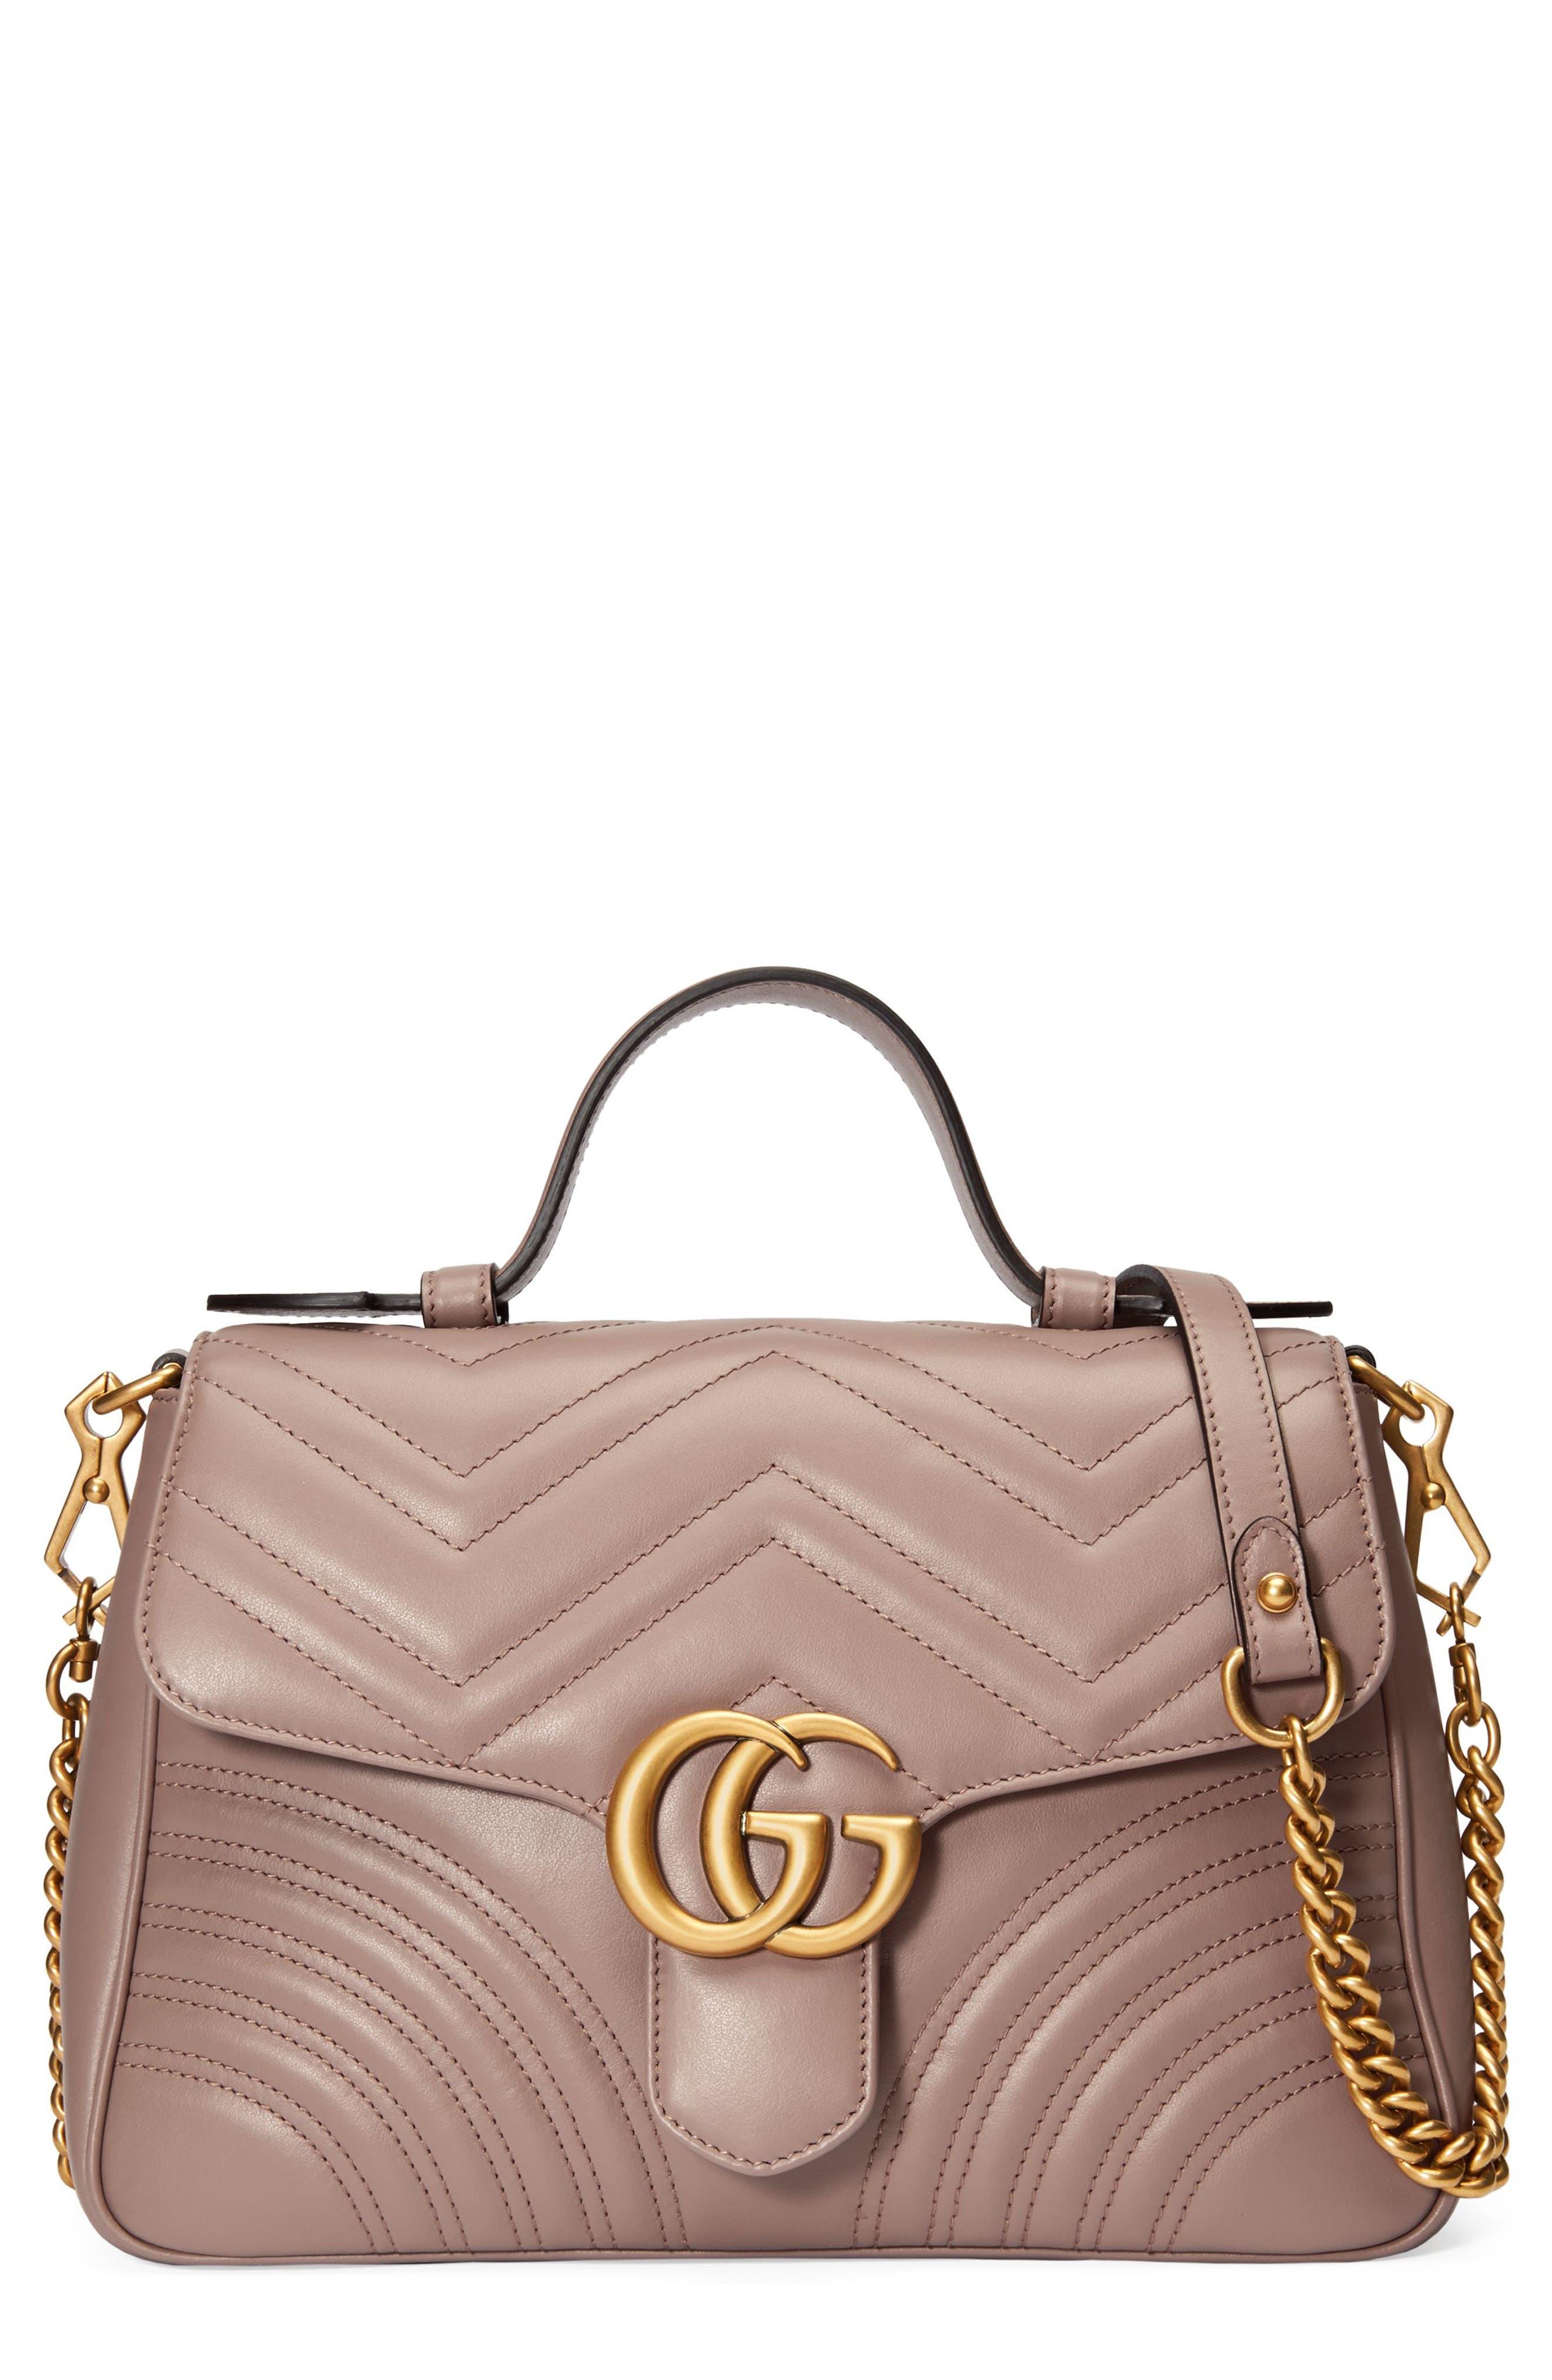 Main Image - Gucci Small GG Marmont 2.0 Matelassé Leather Top Handle Bag